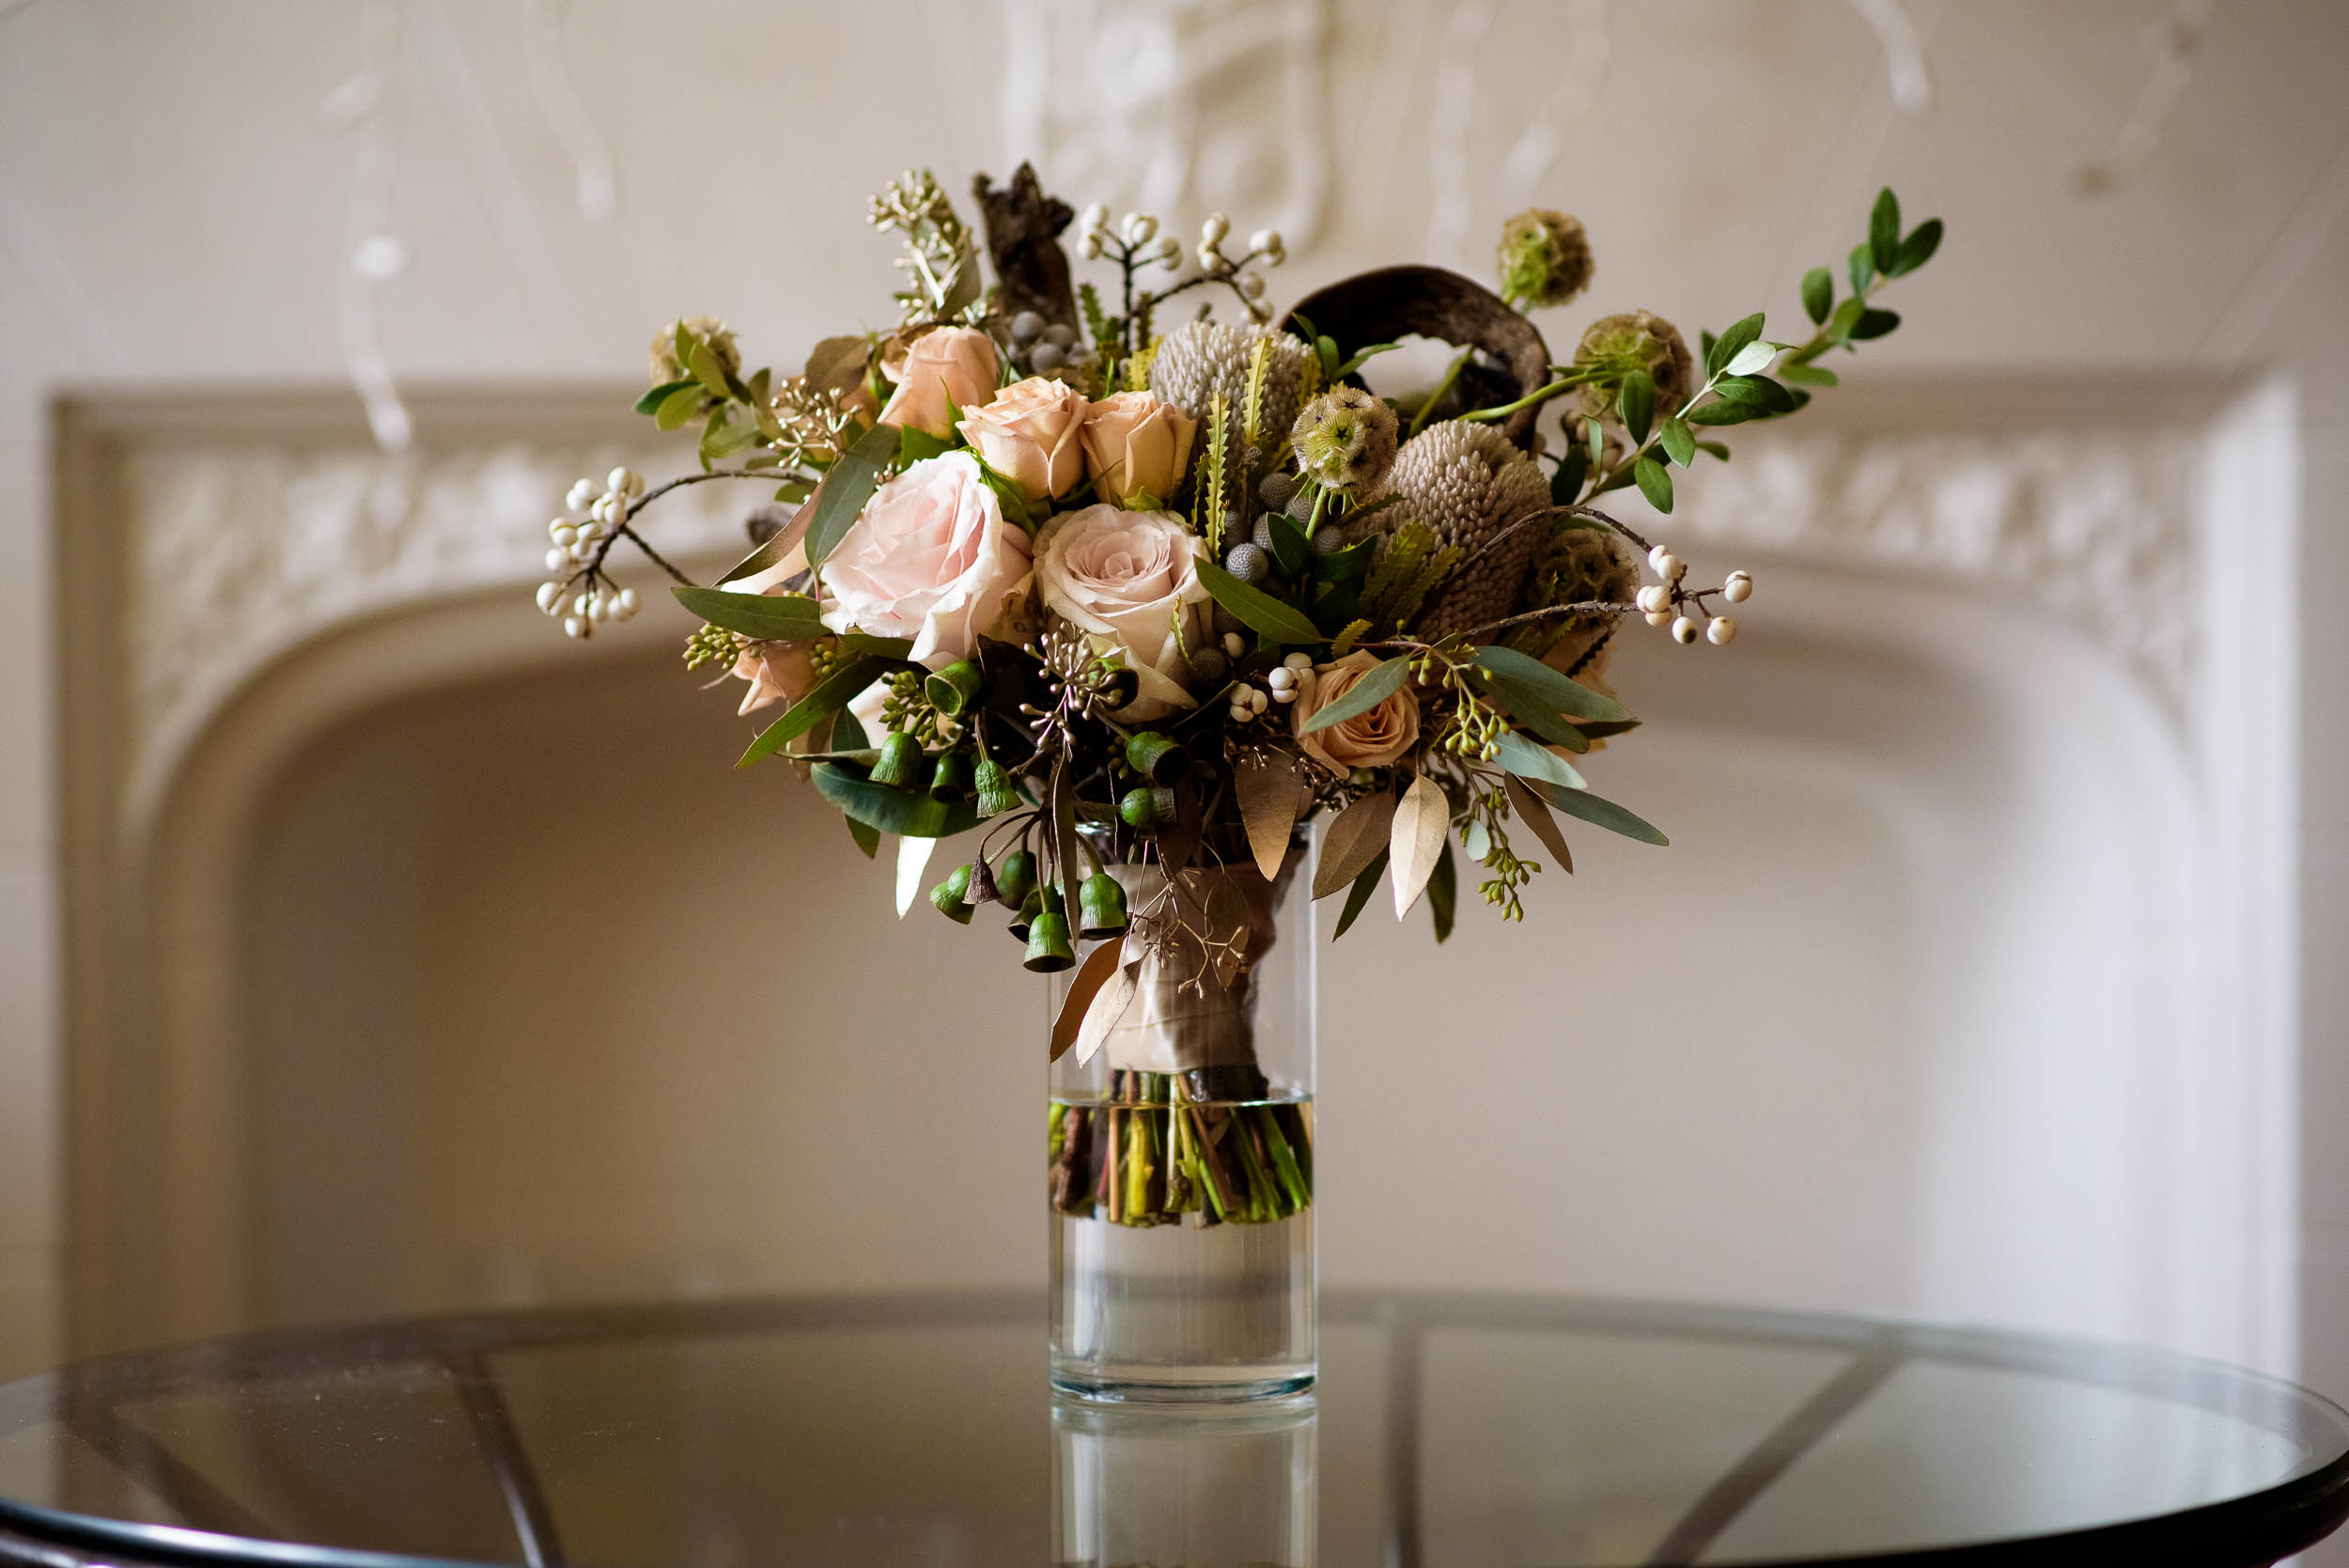 Bridal bouquet by Gratitude Heart Garden before a Loft on Lake Chicago wedding.